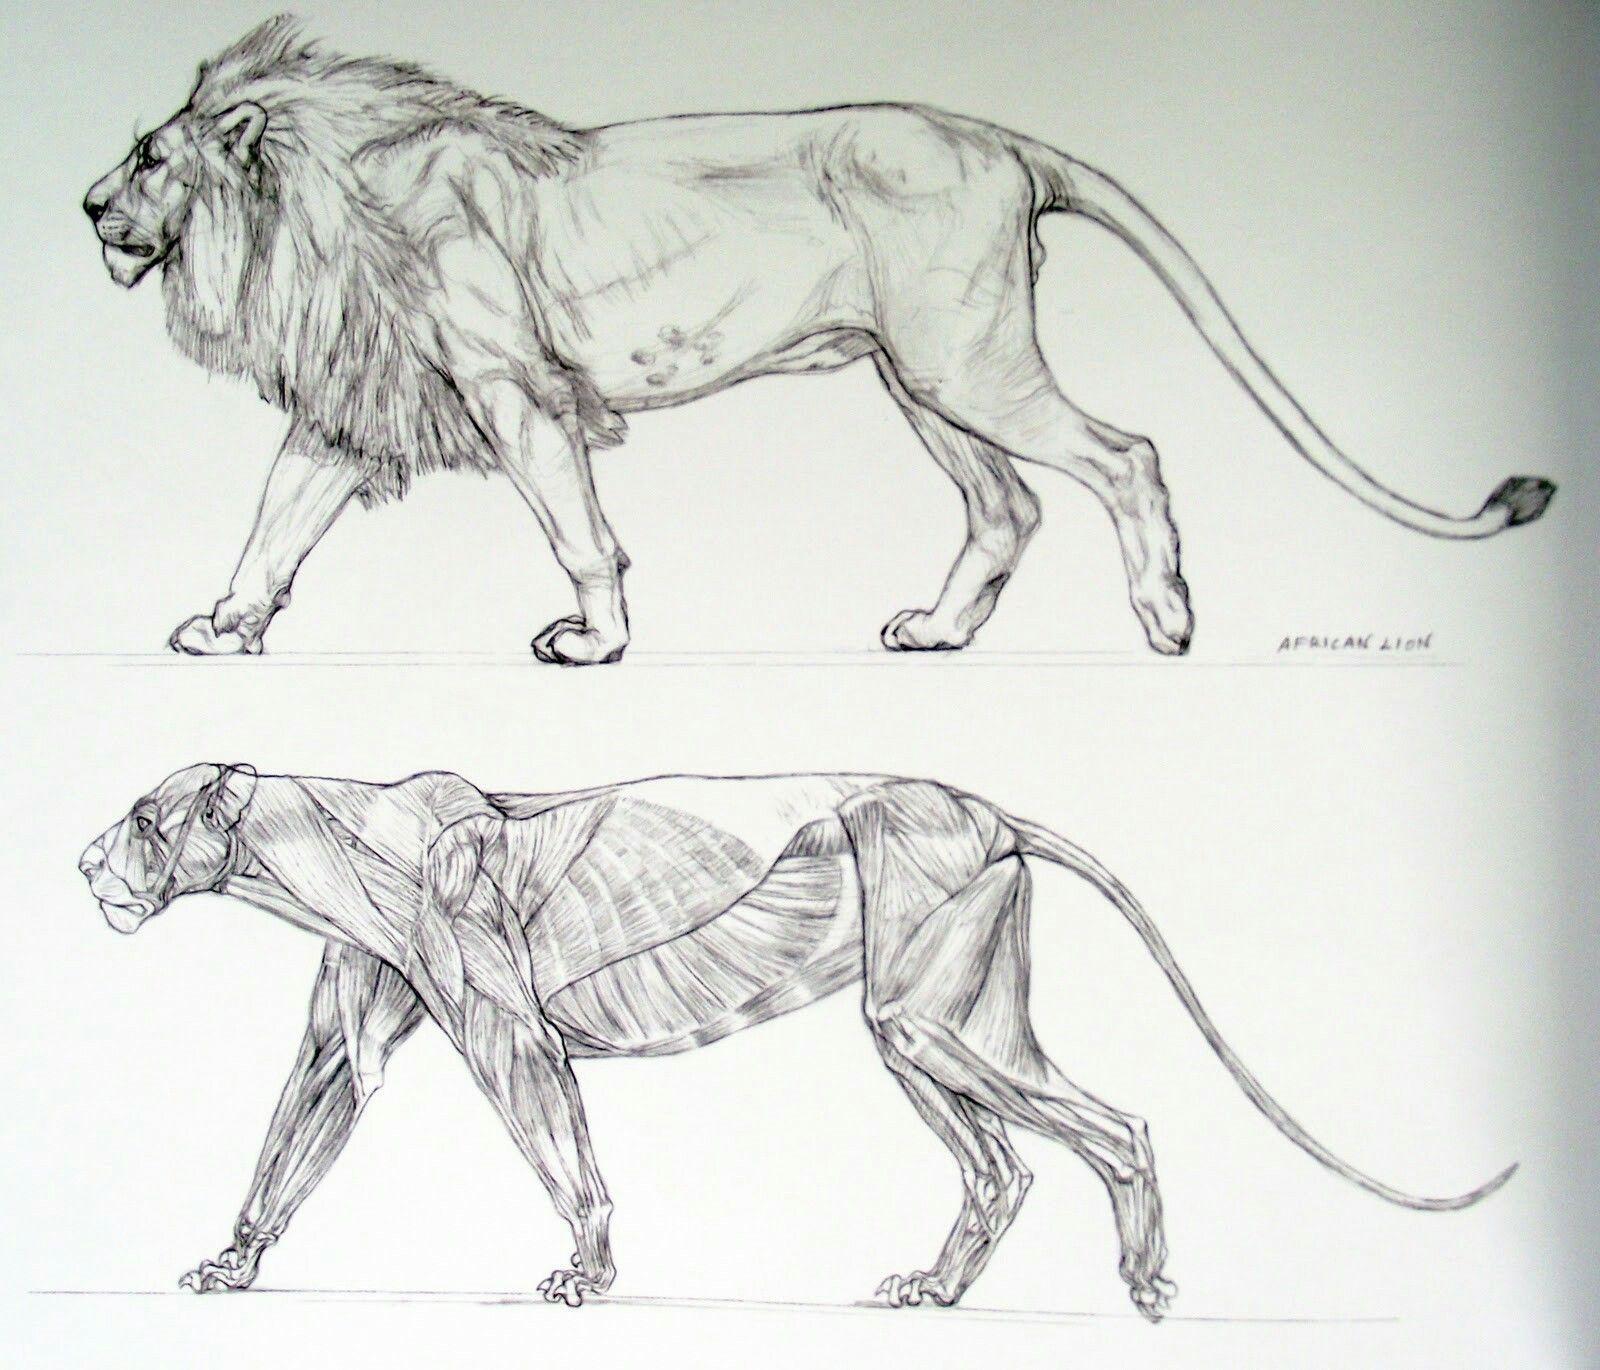 Pin By Mitchell Van Der Hulst On Tiger Pinterest Tigers